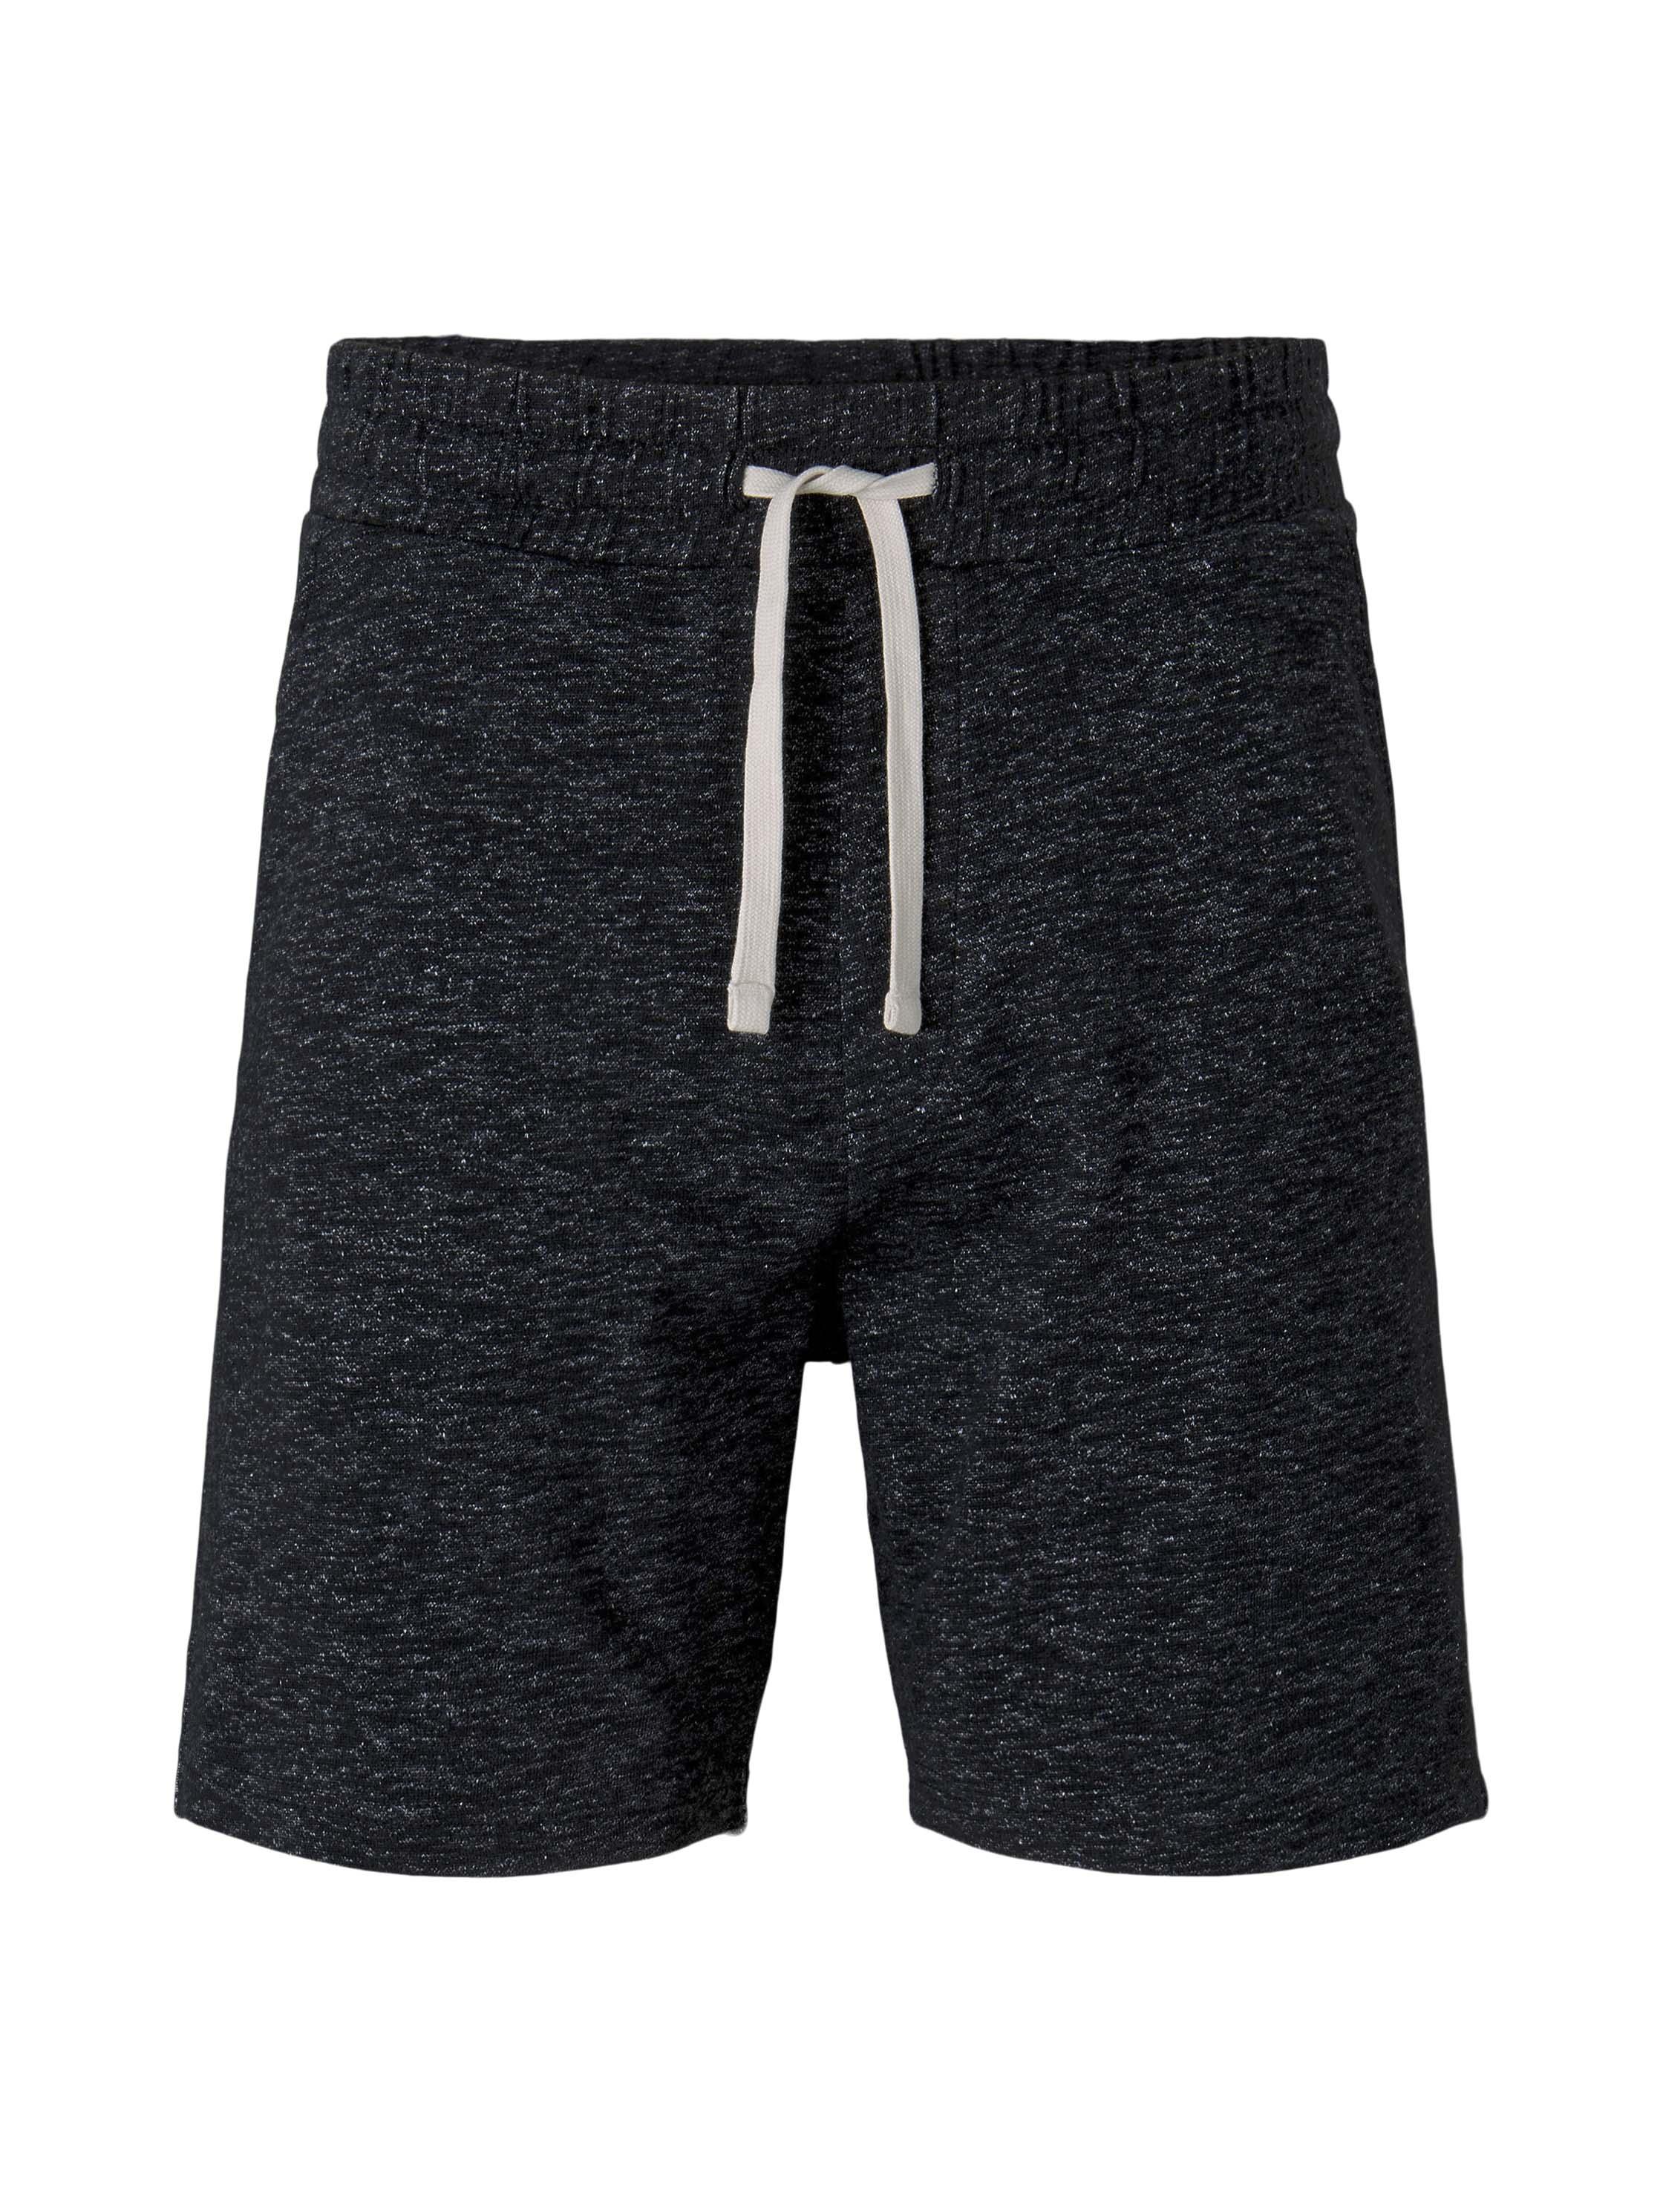 shorts, Black Non-Solid